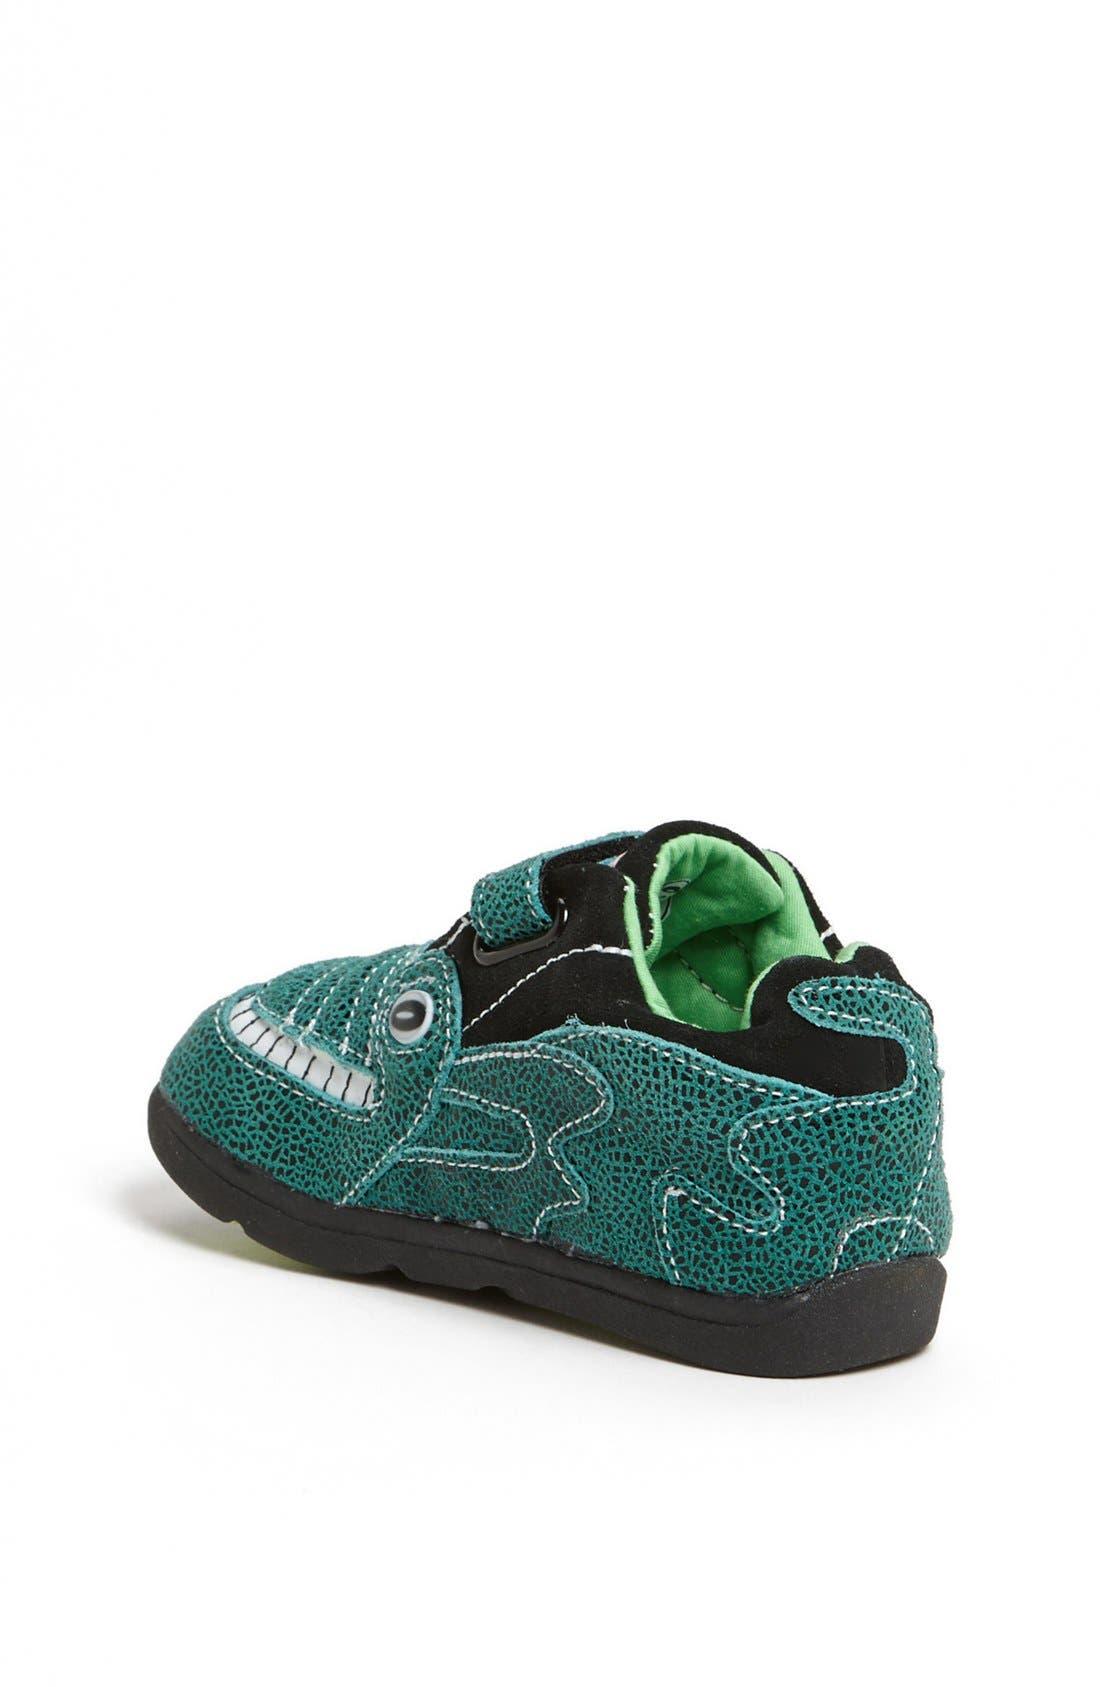 Alternate Image 2  - Zooligans™ 'Jacques the Gator' Sneaker (Baby, Walker, Toddler & Little Kid)